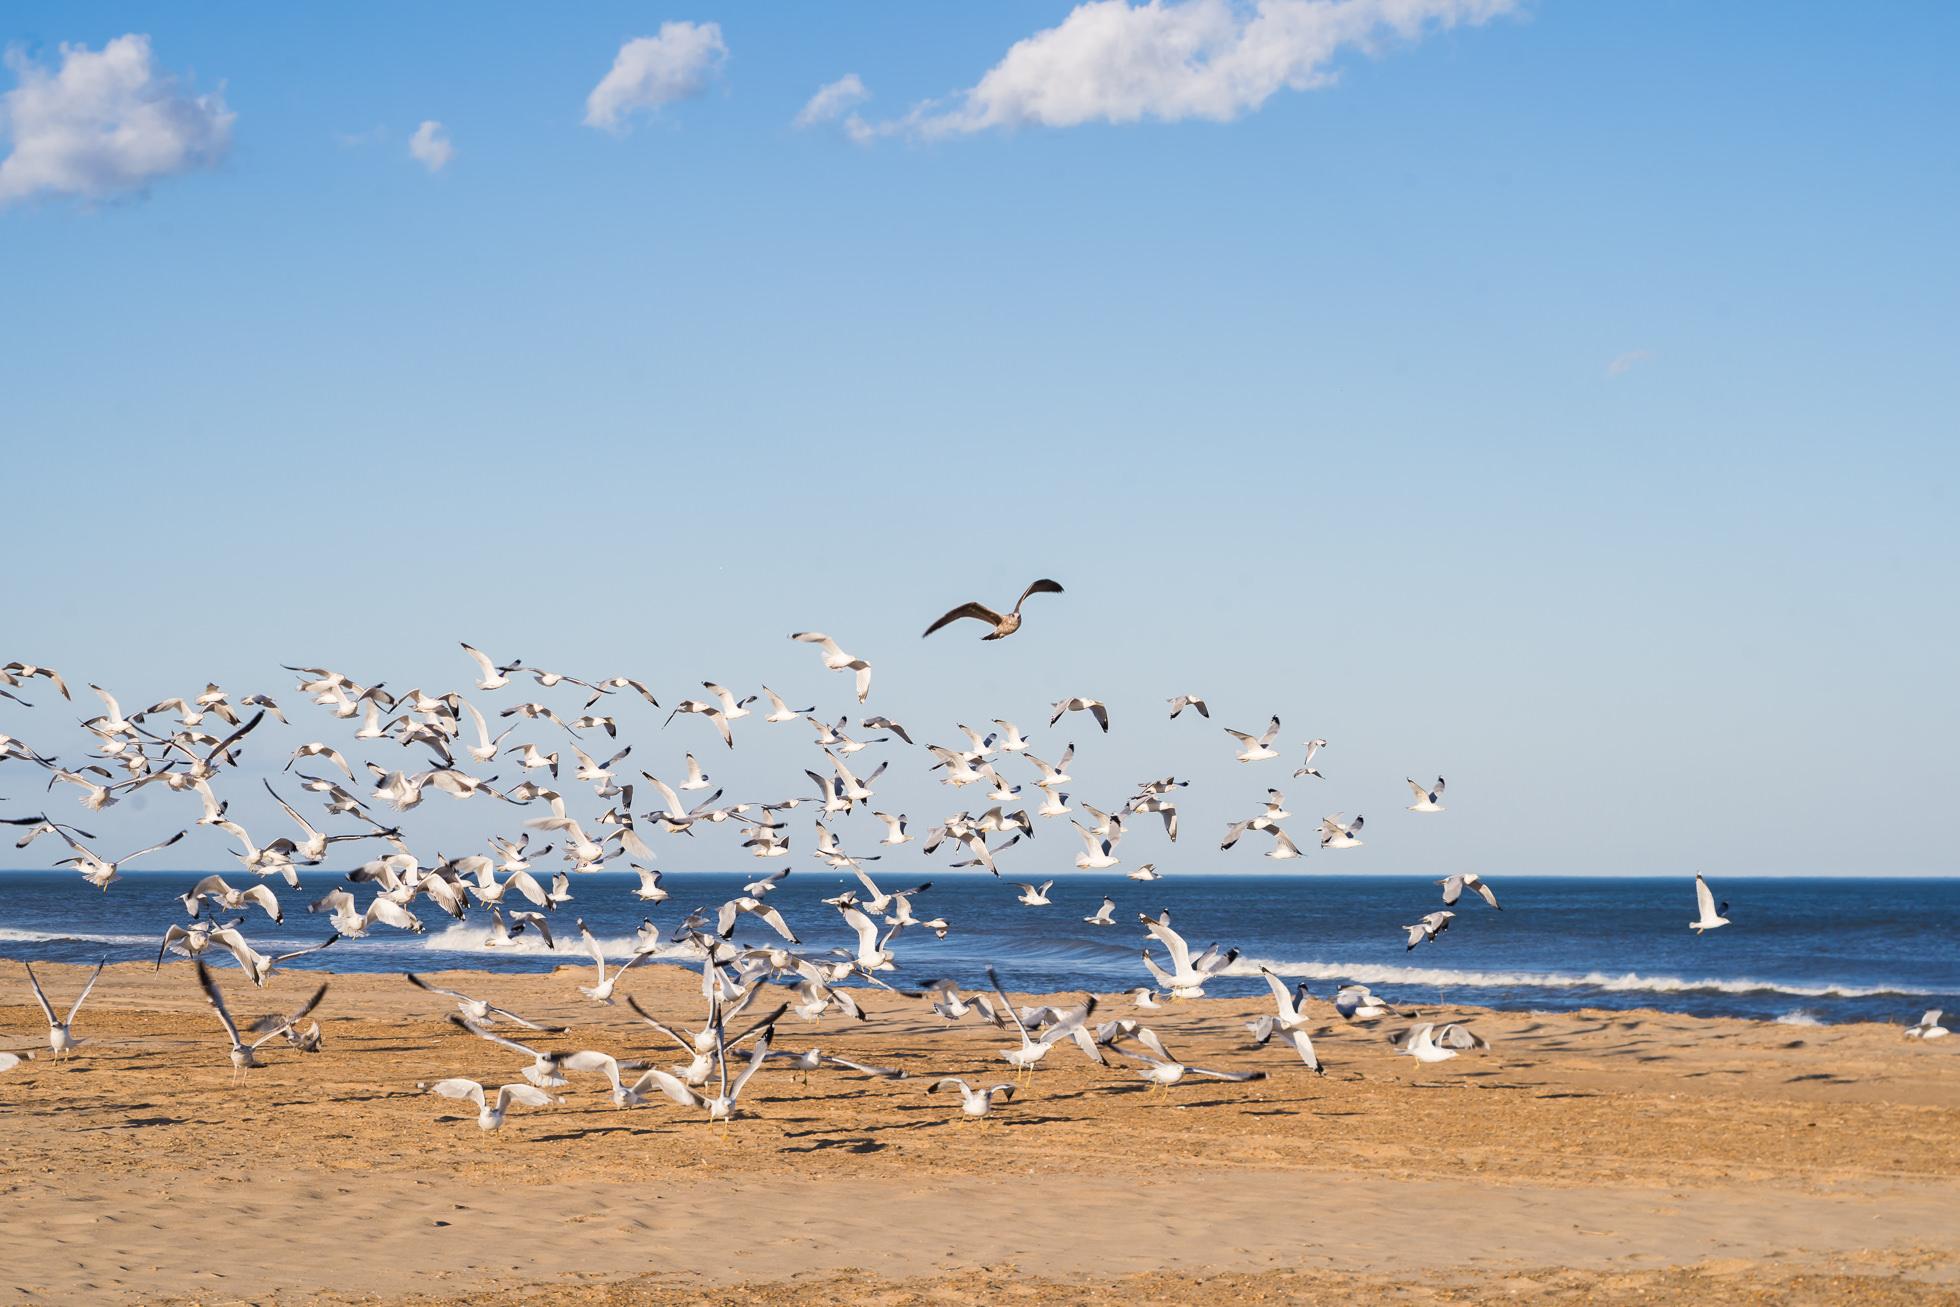 beach, virginia beach photography, nature photographer, seagulls